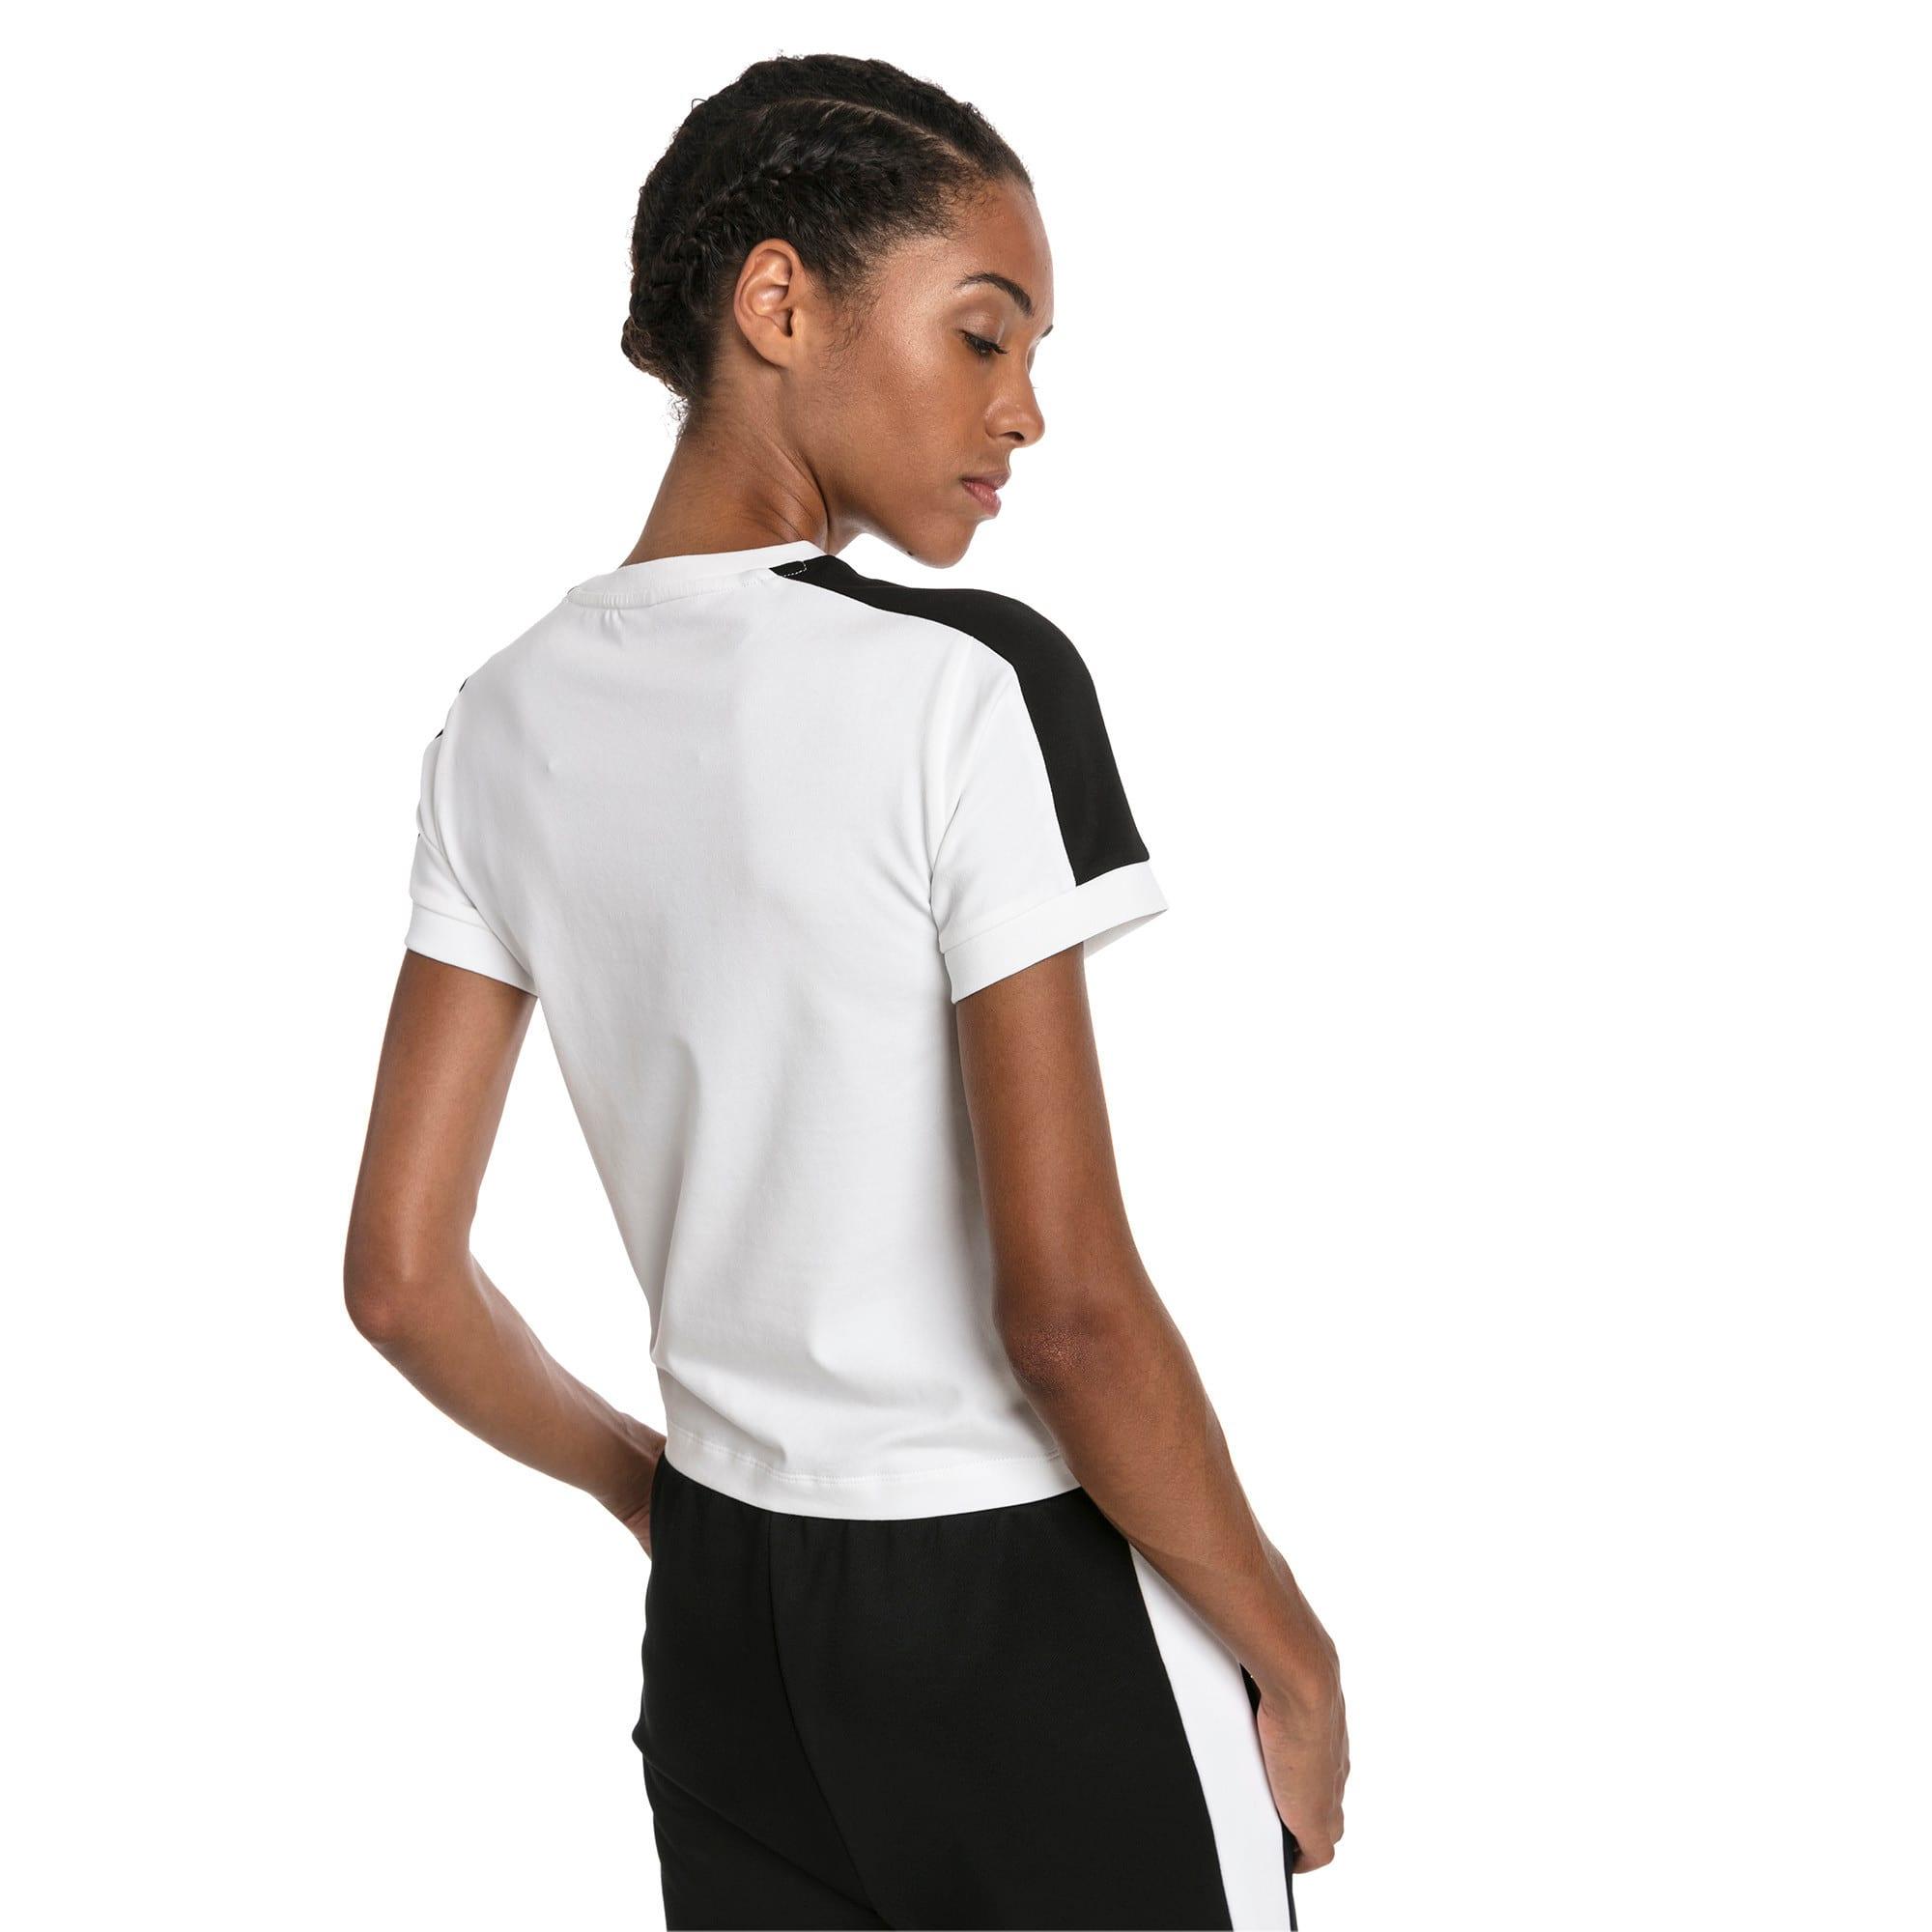 Thumbnail 3 of CLASSICS タイト ウィメンズ SS Tシャツ 半袖, Puma White-black, medium-JPN